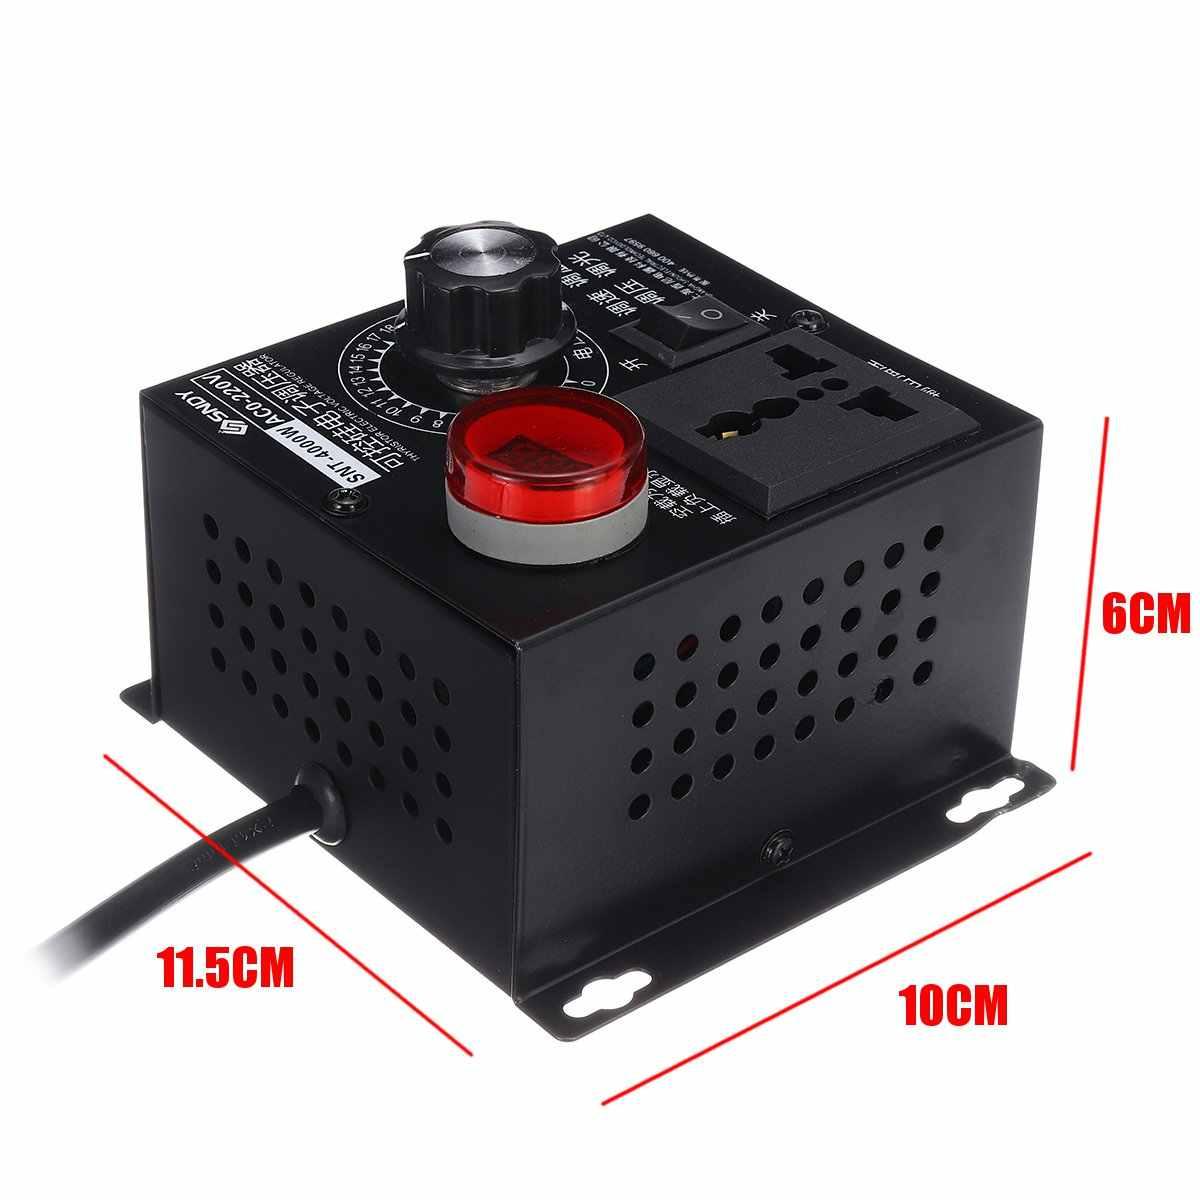 AC 0V-220V 4000 วัตต์ซิลิโคน Electronics แรงดันไฟฟ้า Machinery Electric VARIABLE SPEED CONTROLLER